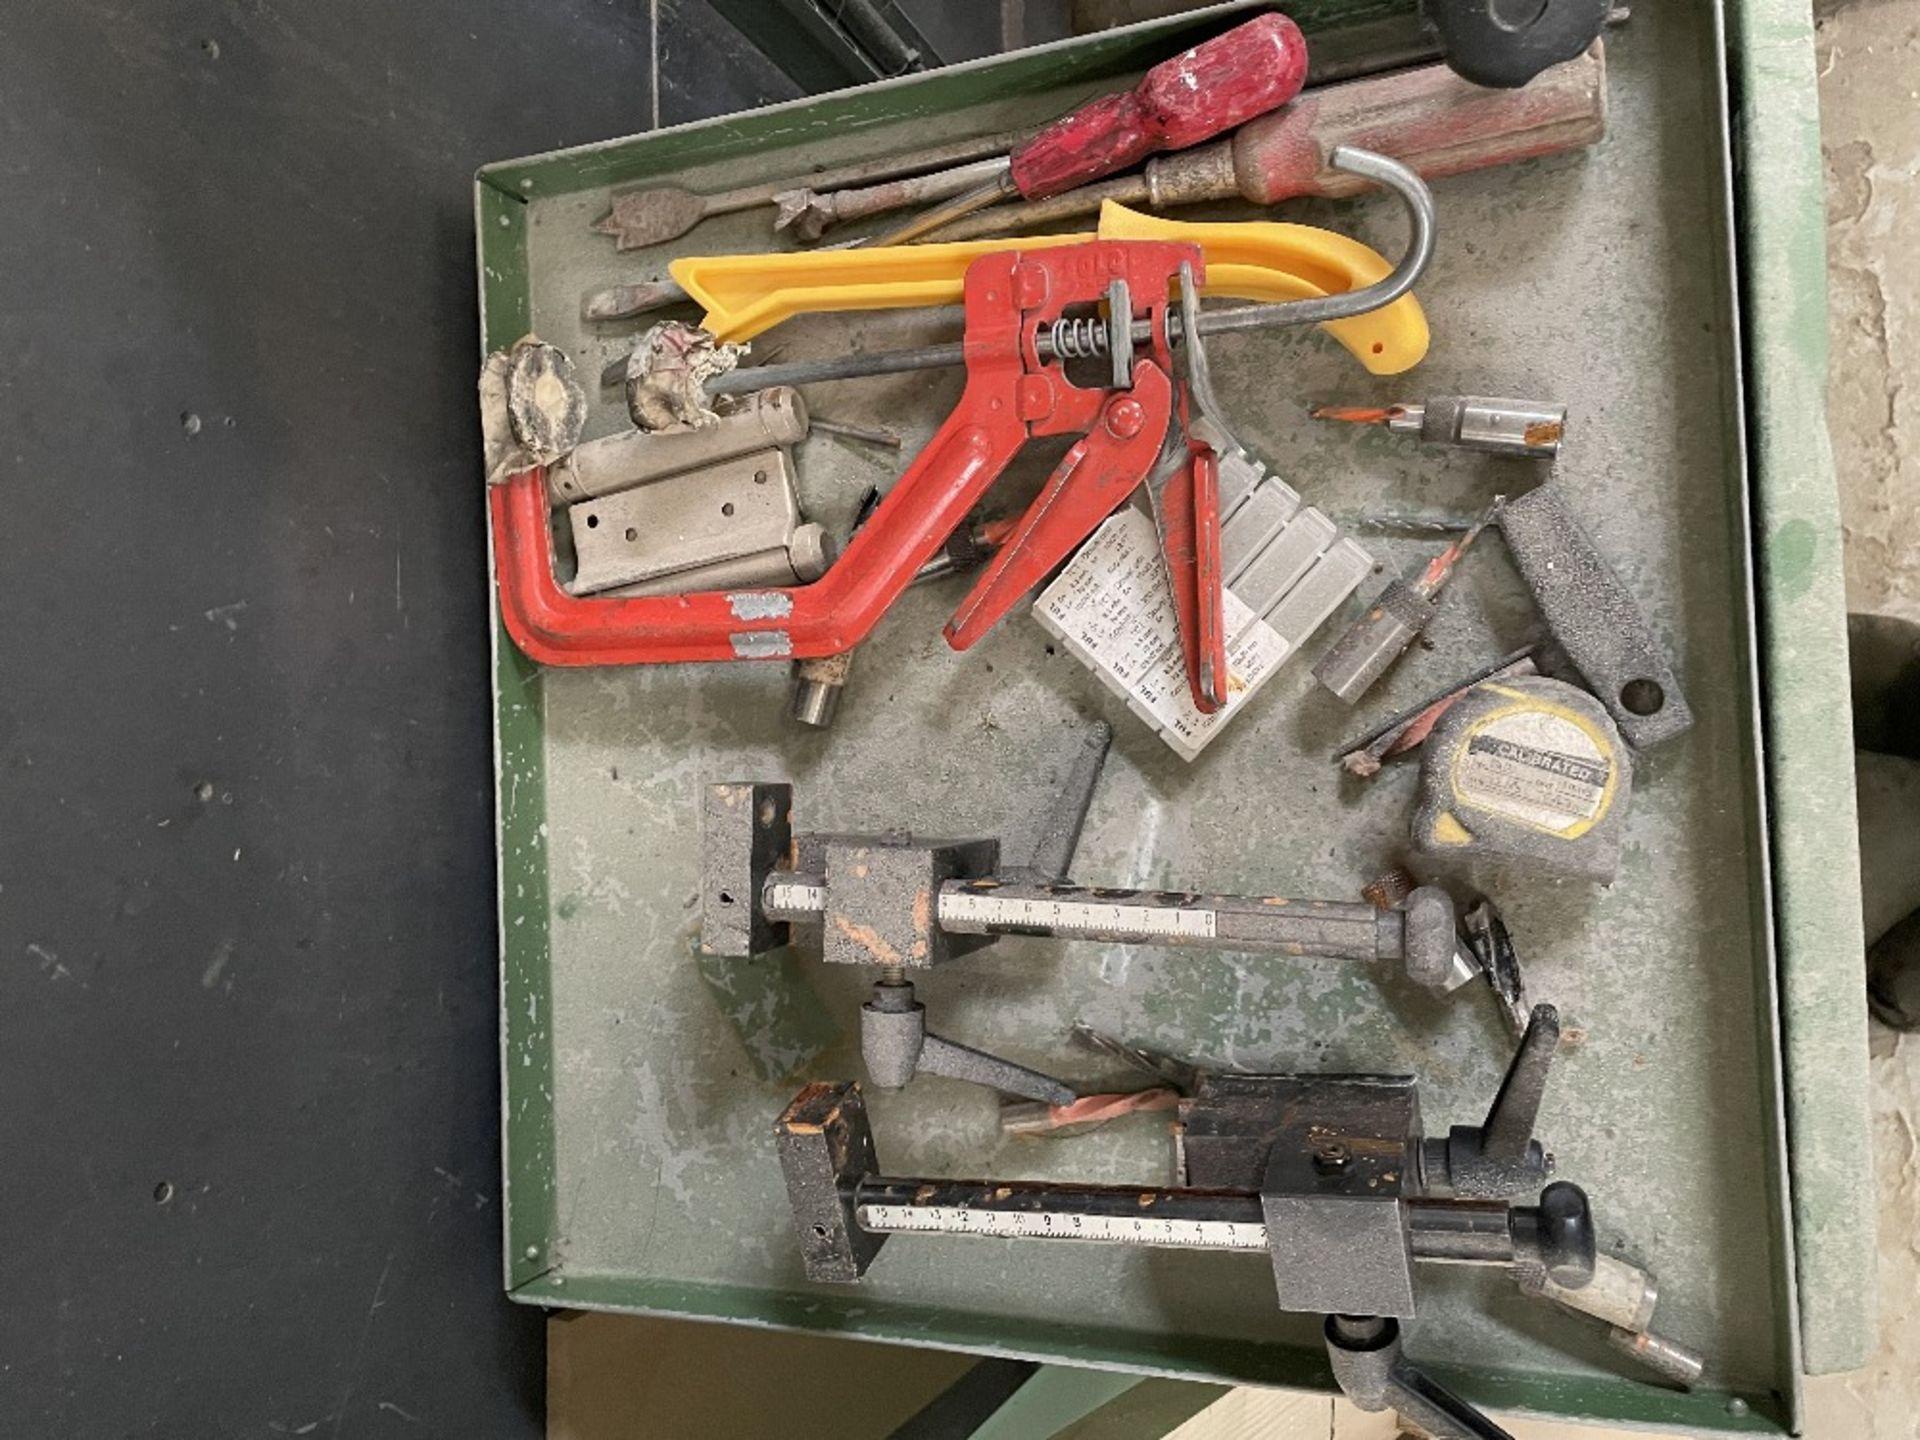 Maggi 3532 4 Head Boring Machine w/ Tool Cabinet & Tooling | YOM: 1999 - Image 12 of 12